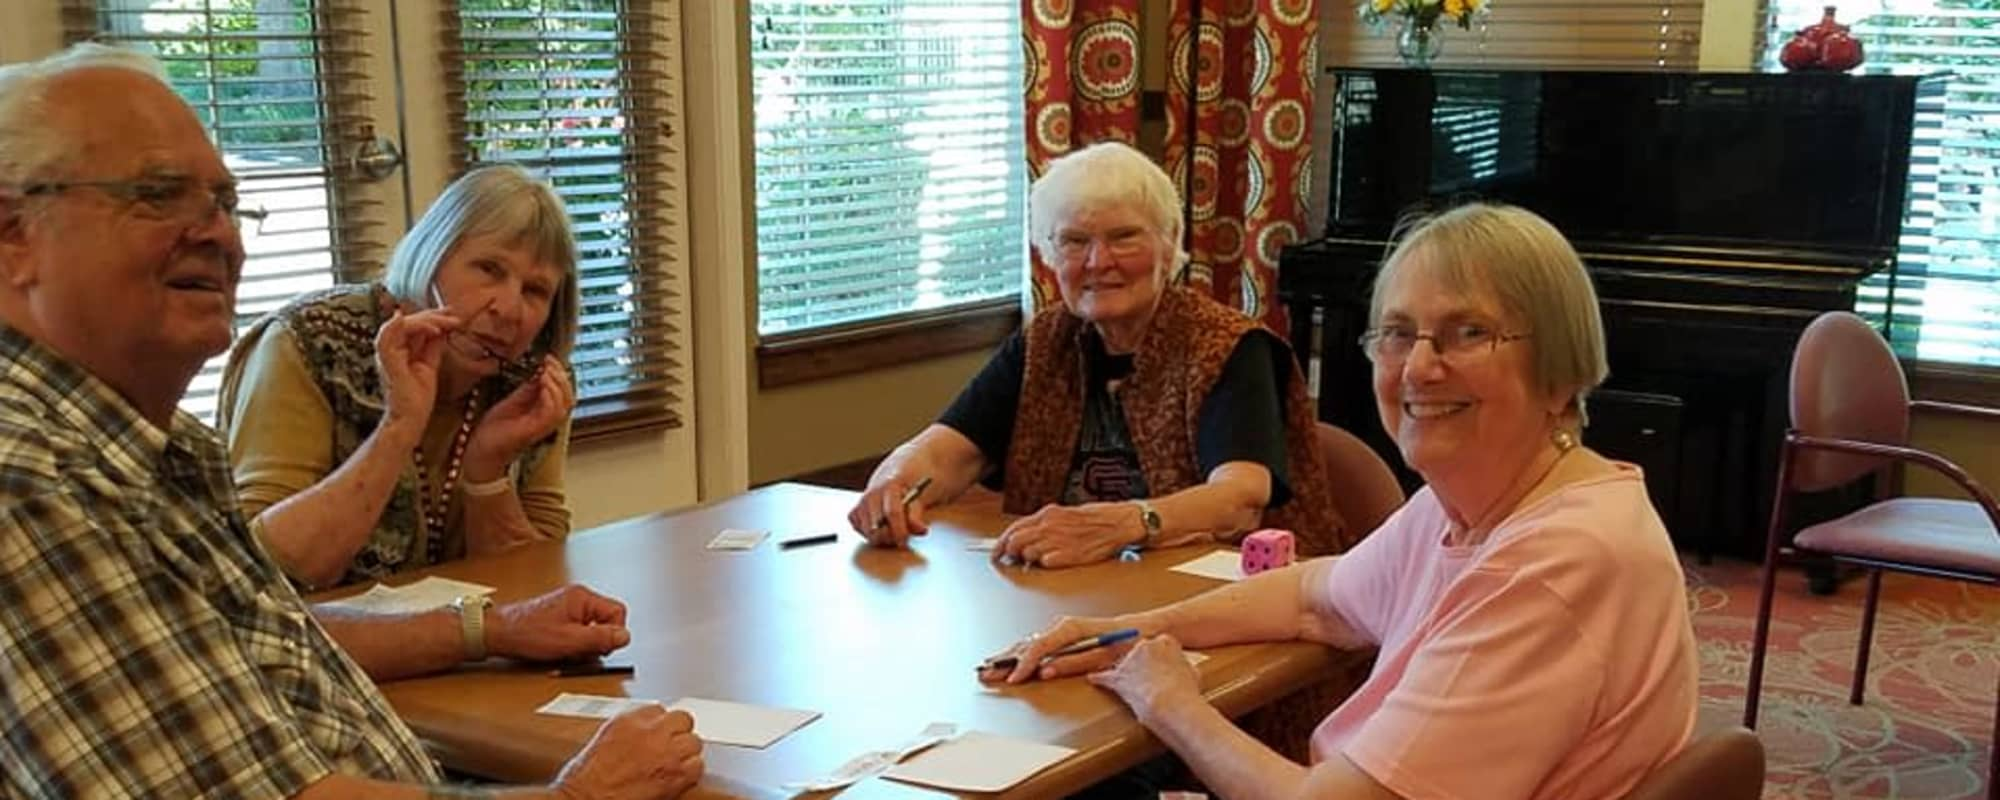 Residents playing games at Oakmont Gardens in Santa Rosa, California